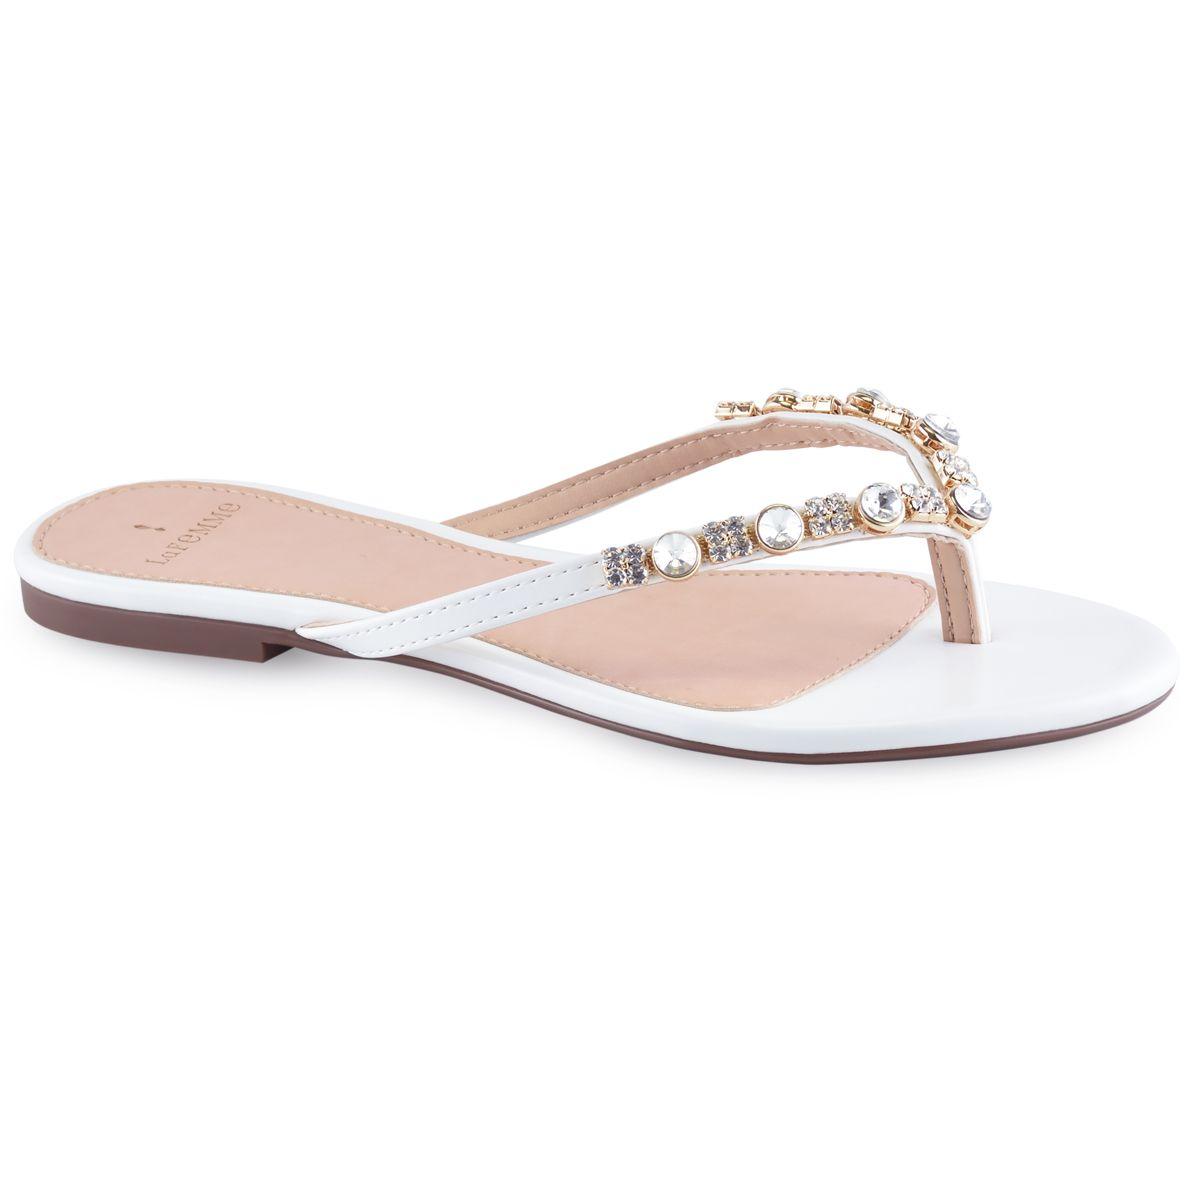 Pin em Sapatos flats femininos La Femme